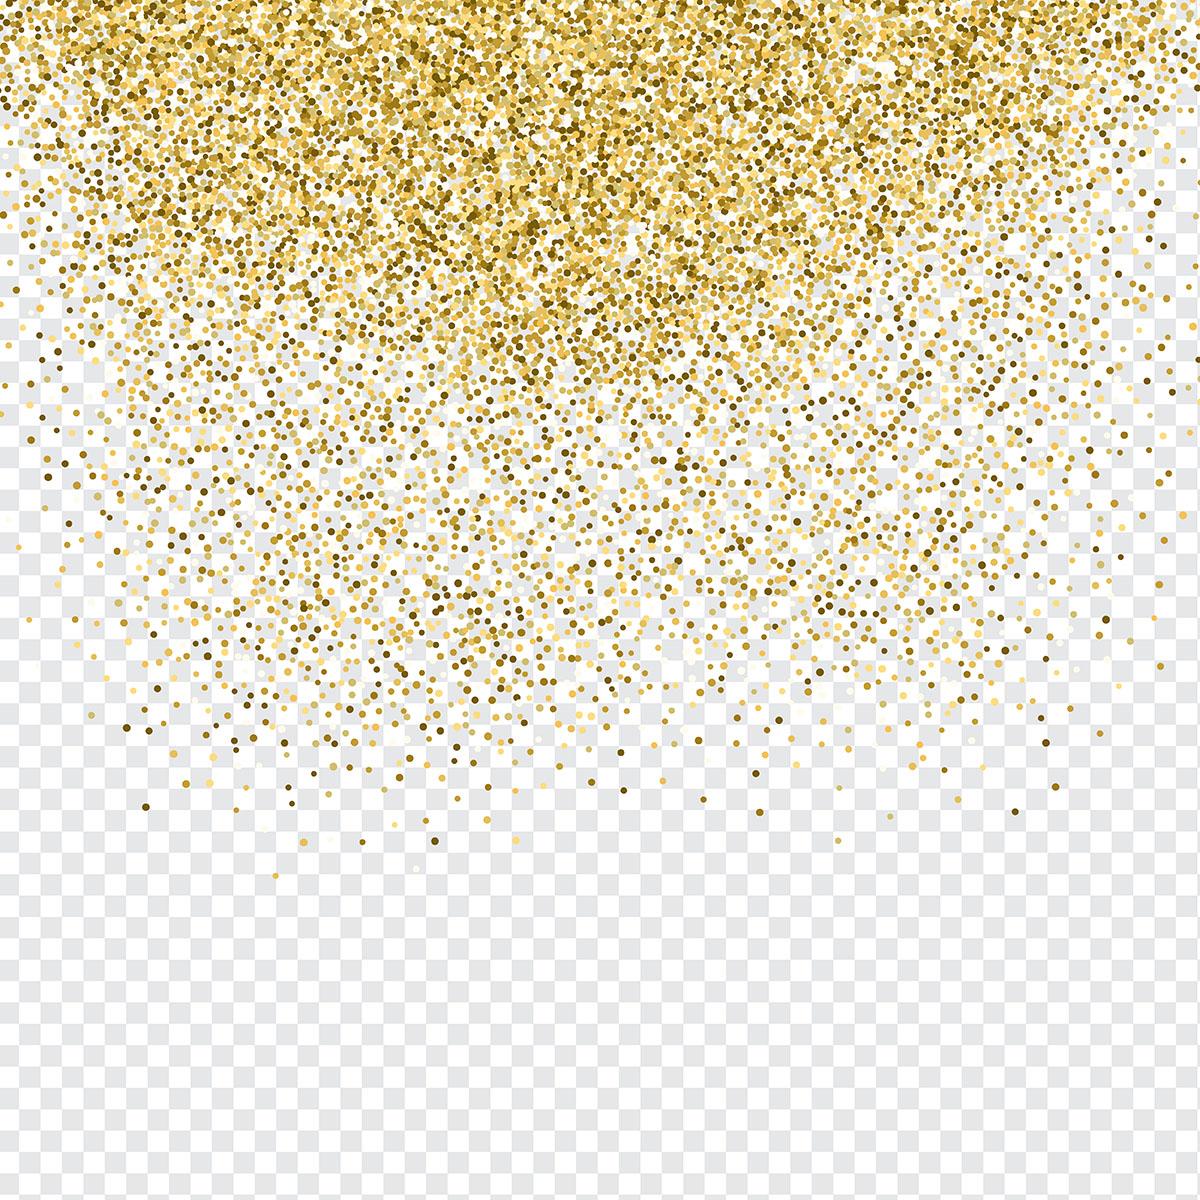 Gold Glitter Free Vector Art - (5569 Free Downloads)